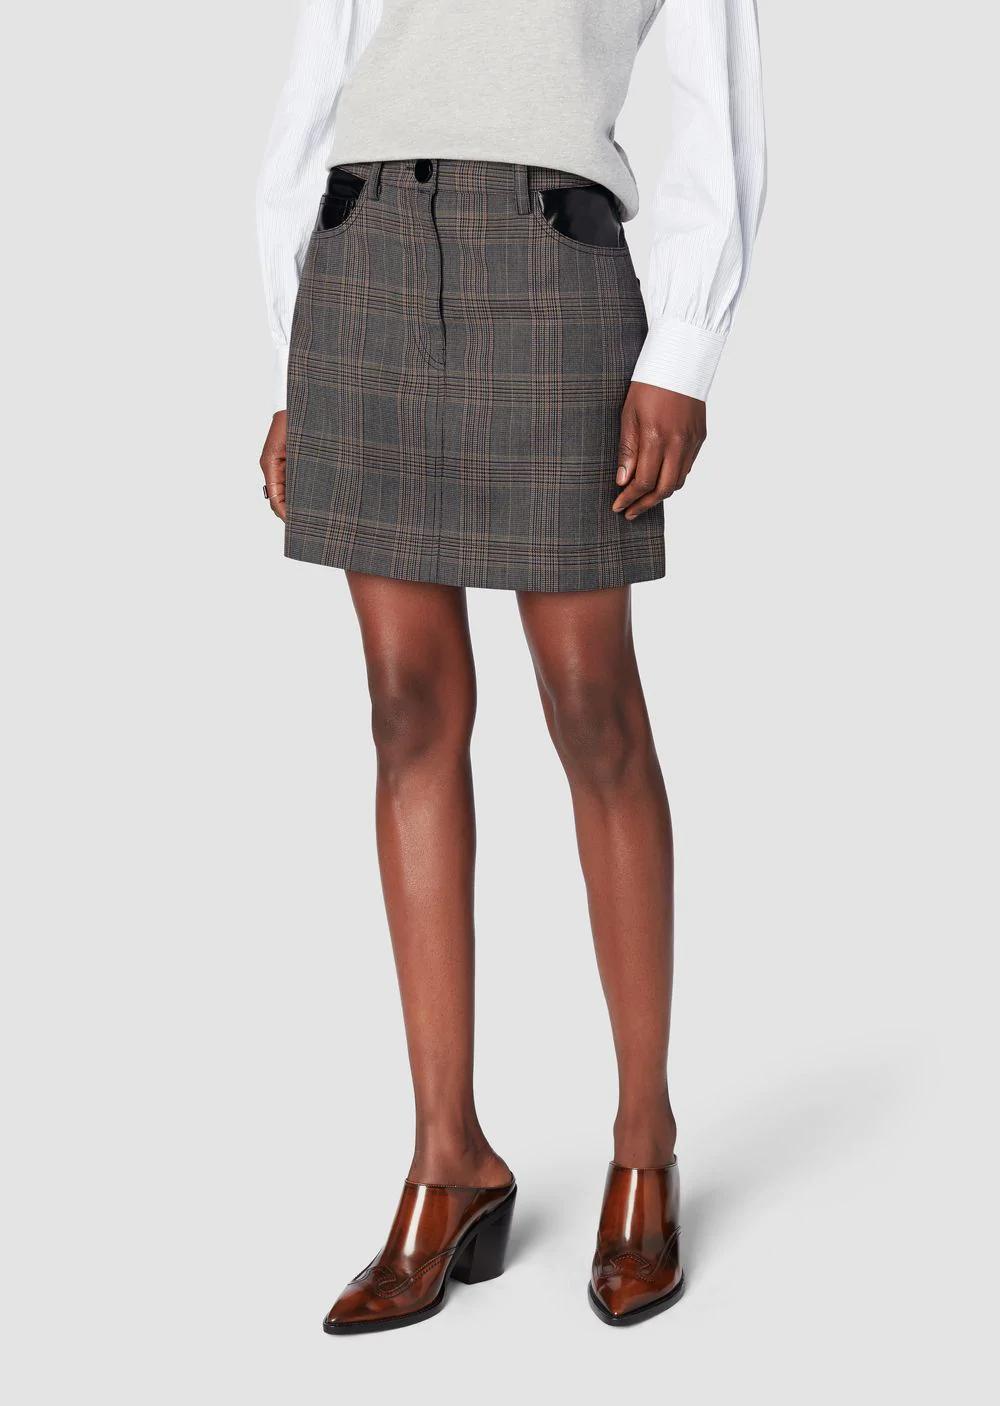 ce6dc807b1 Derek Lam 10 Crosby Plaid Jean Mini Skirt With Faux-Leather Trim In Grey